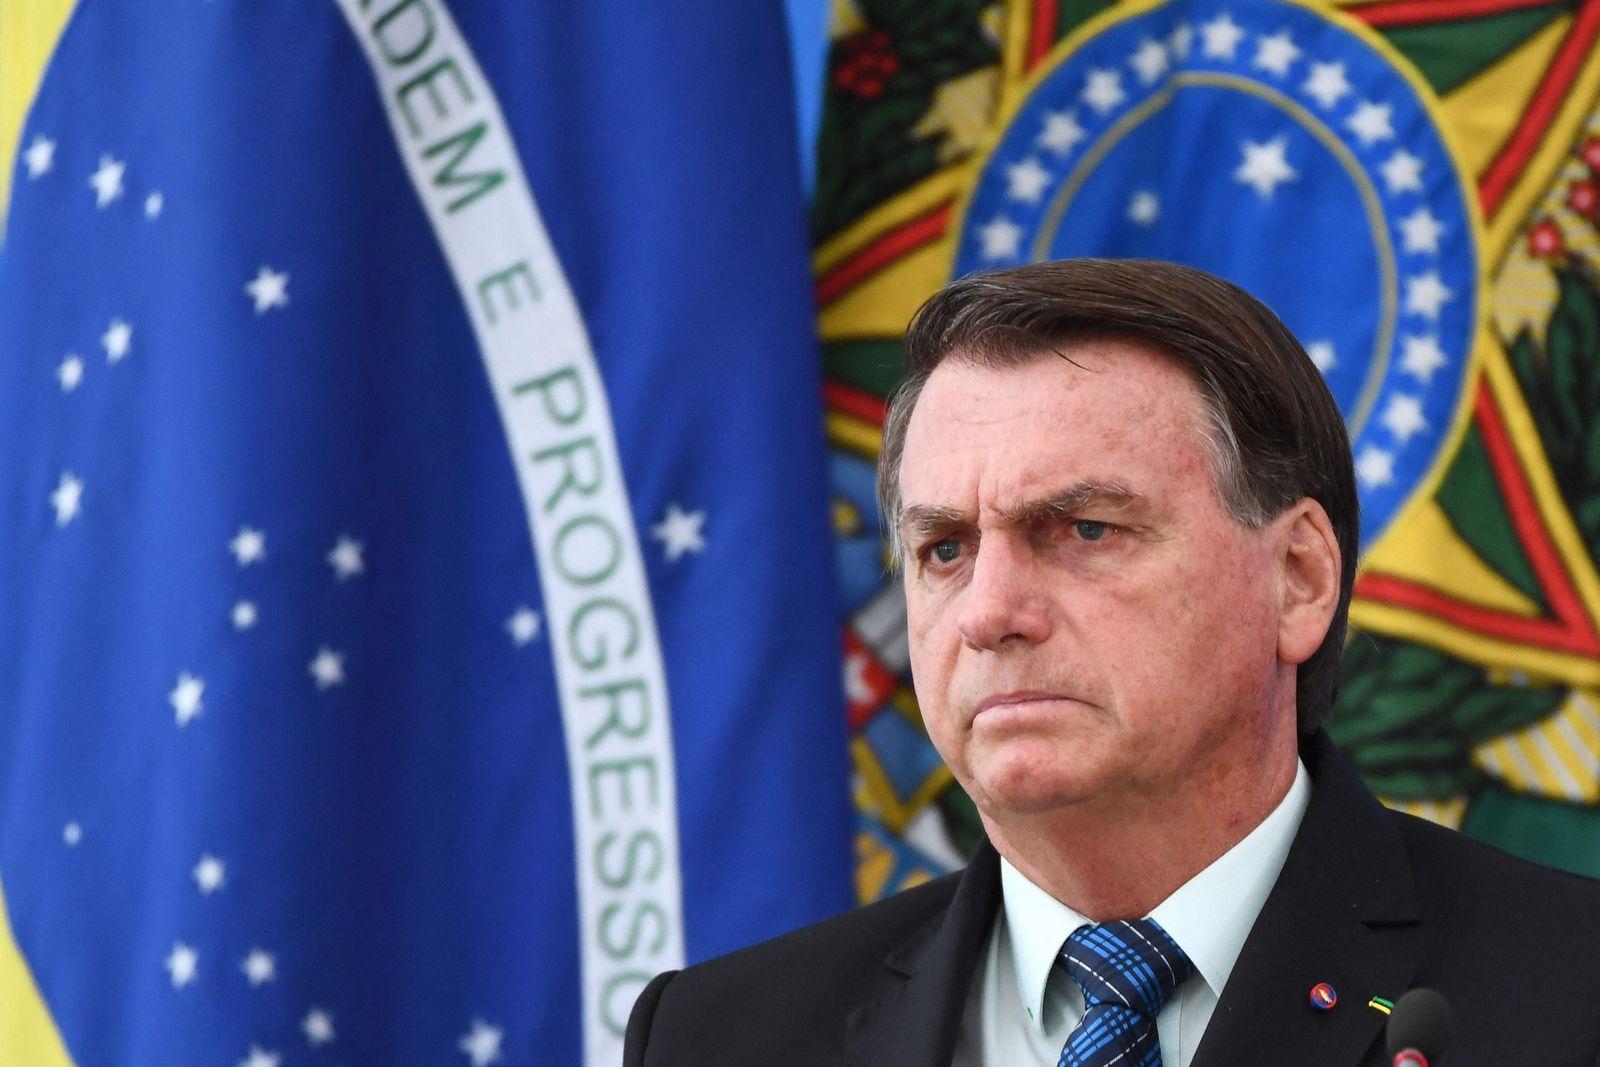 FILES-BRAZIL-ECONOMY